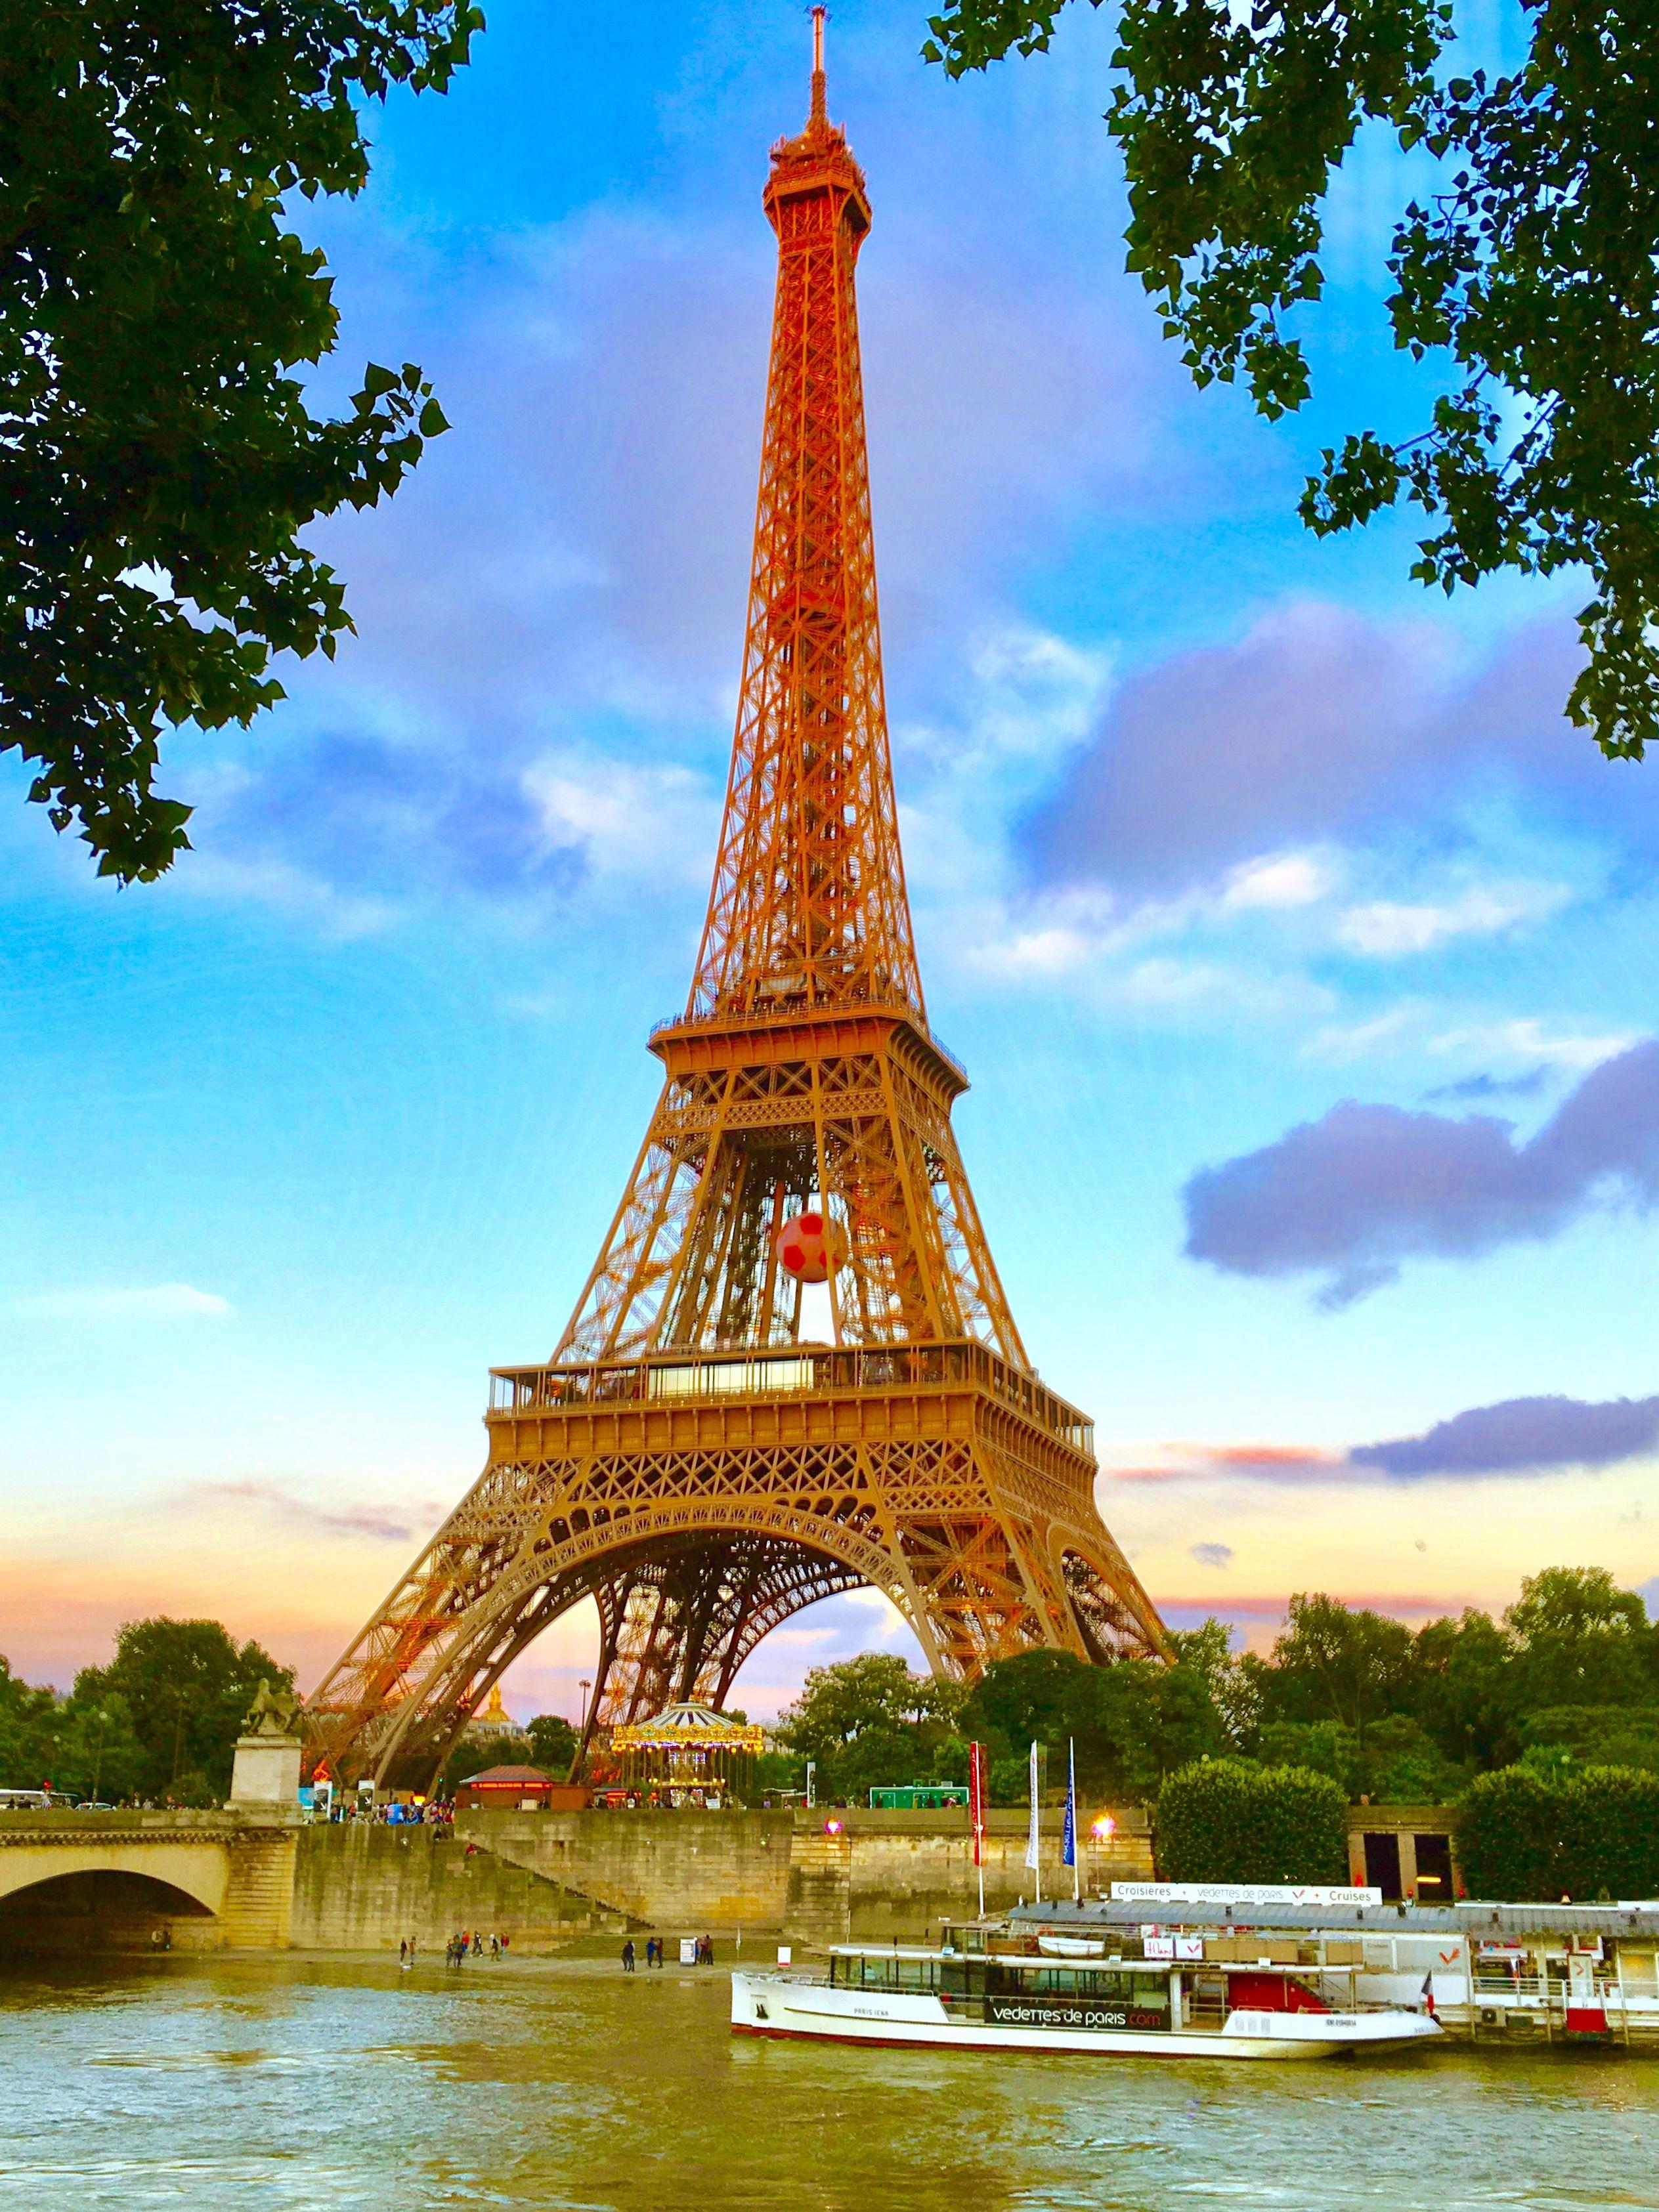 Обои Эйфелева башня, Облака, вид, лодки, красиво. Города foto 15